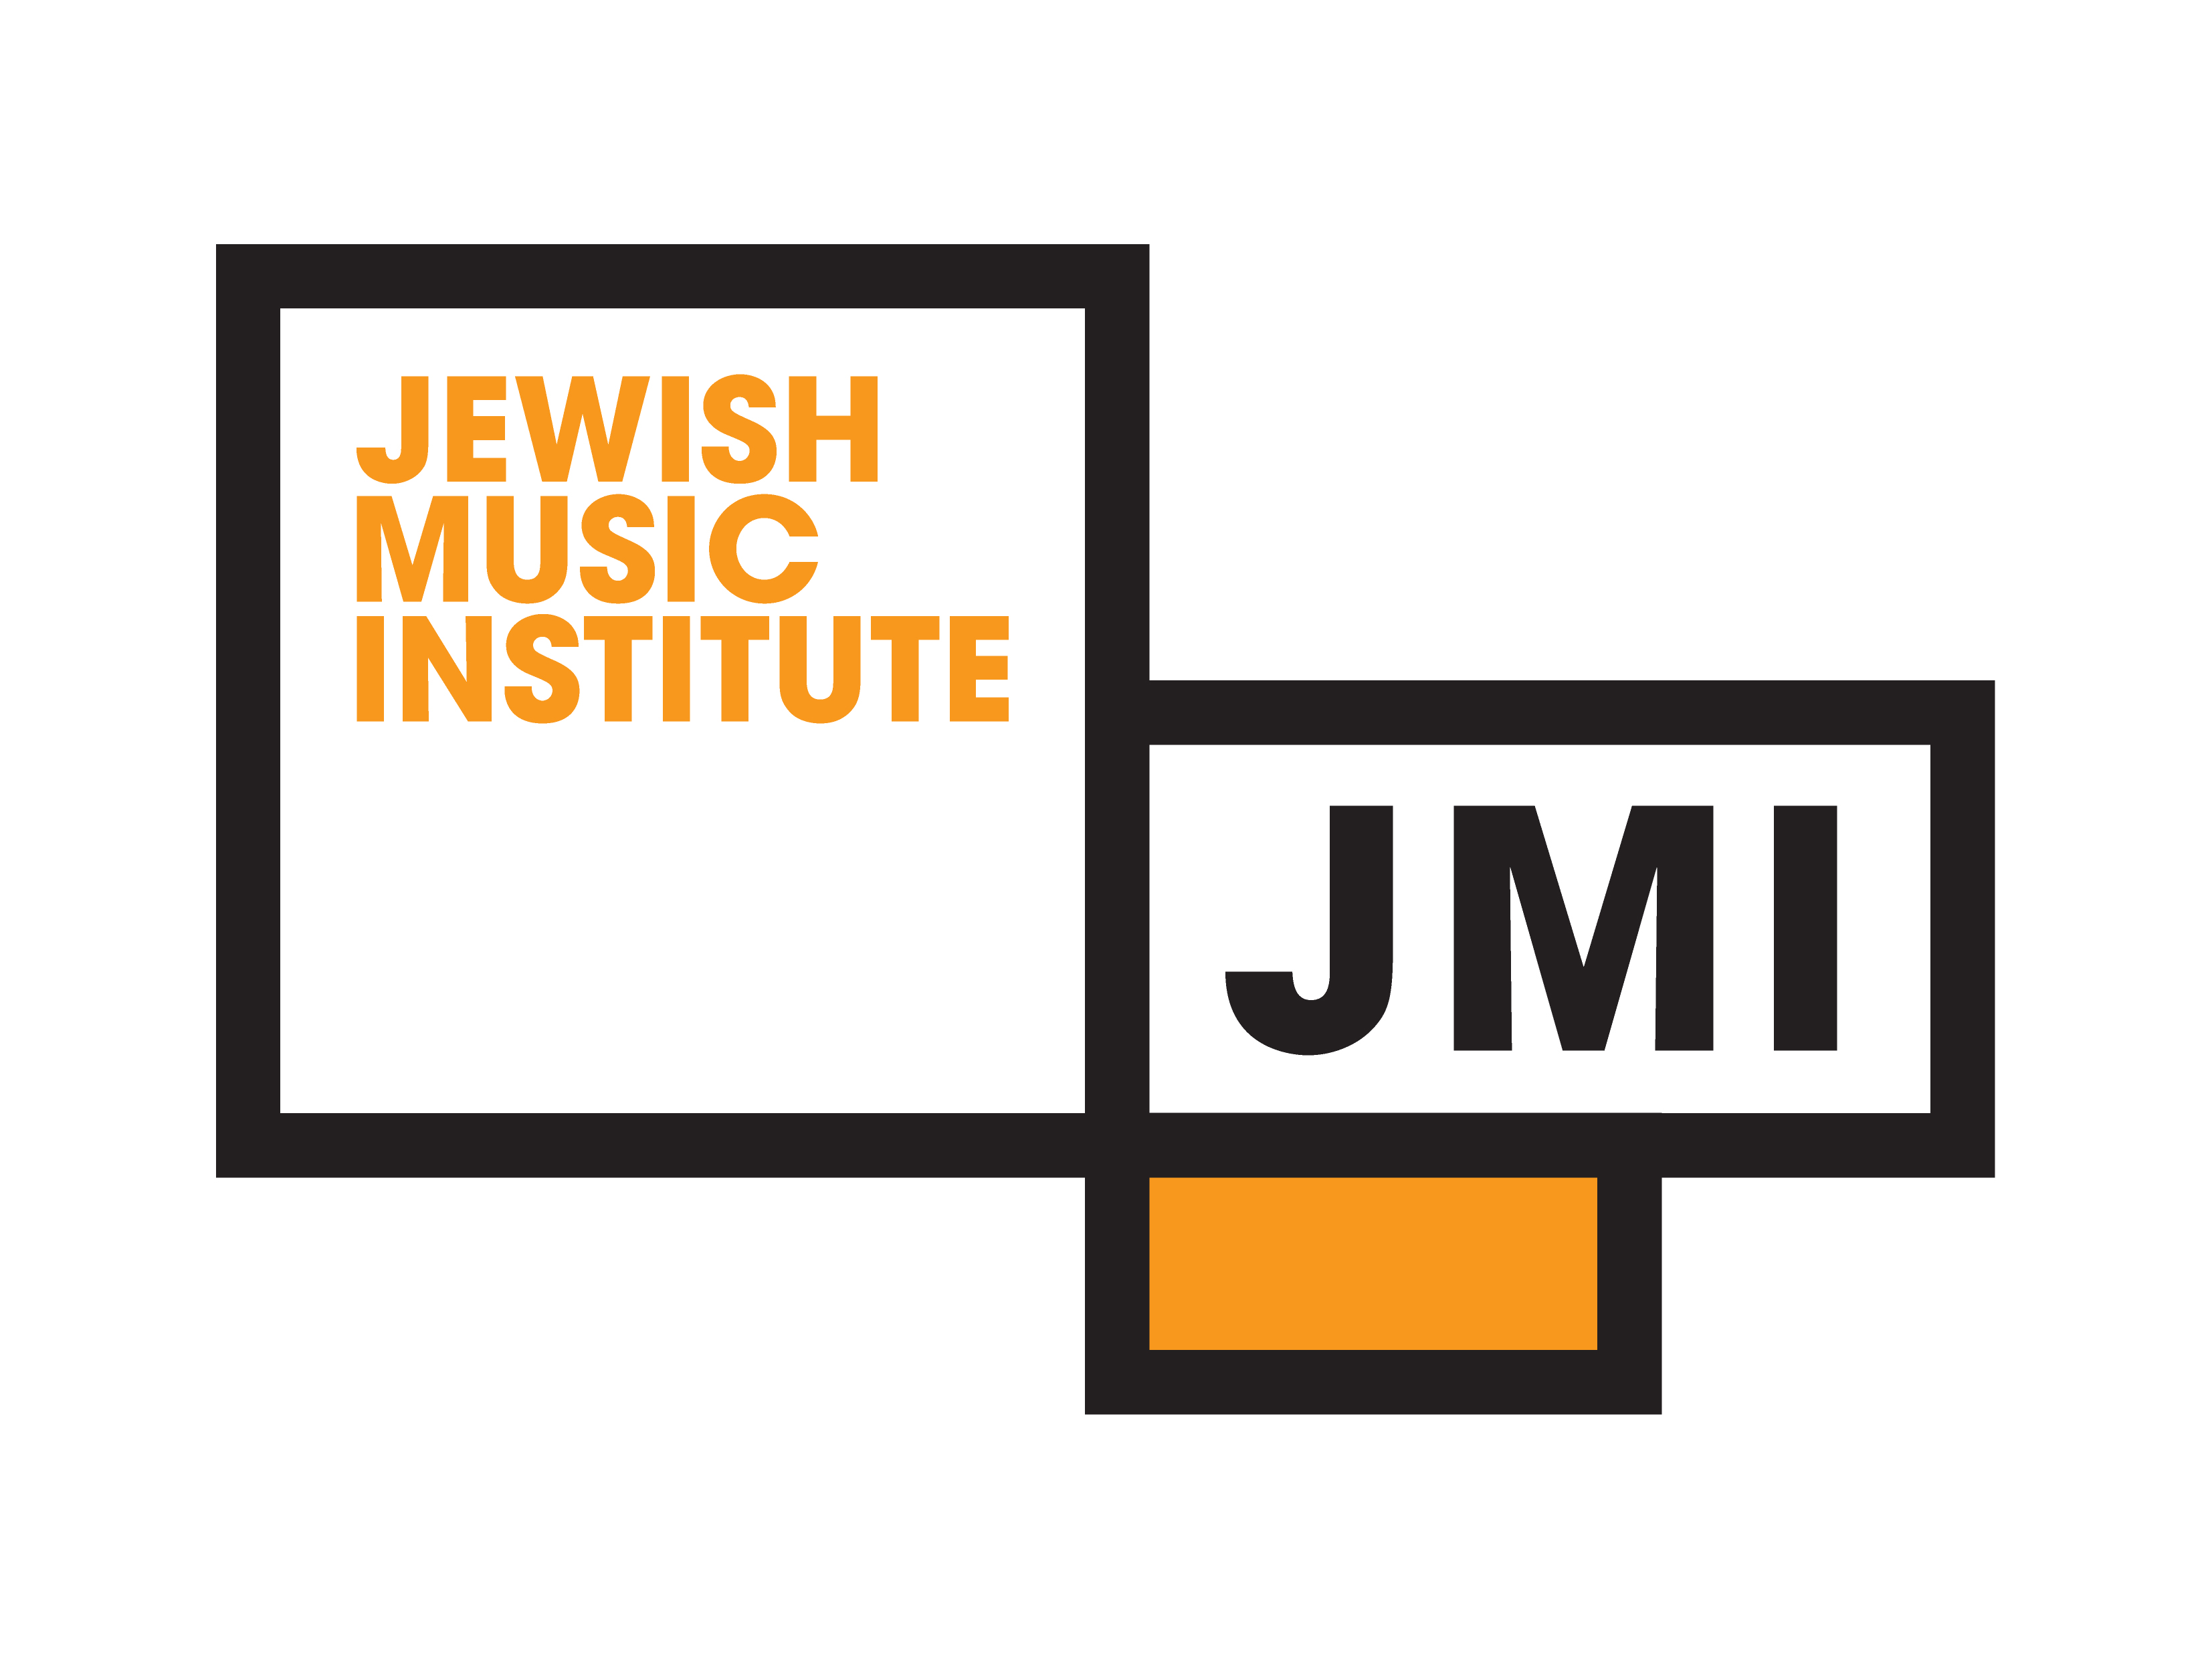 JMI logo and link to JMI website